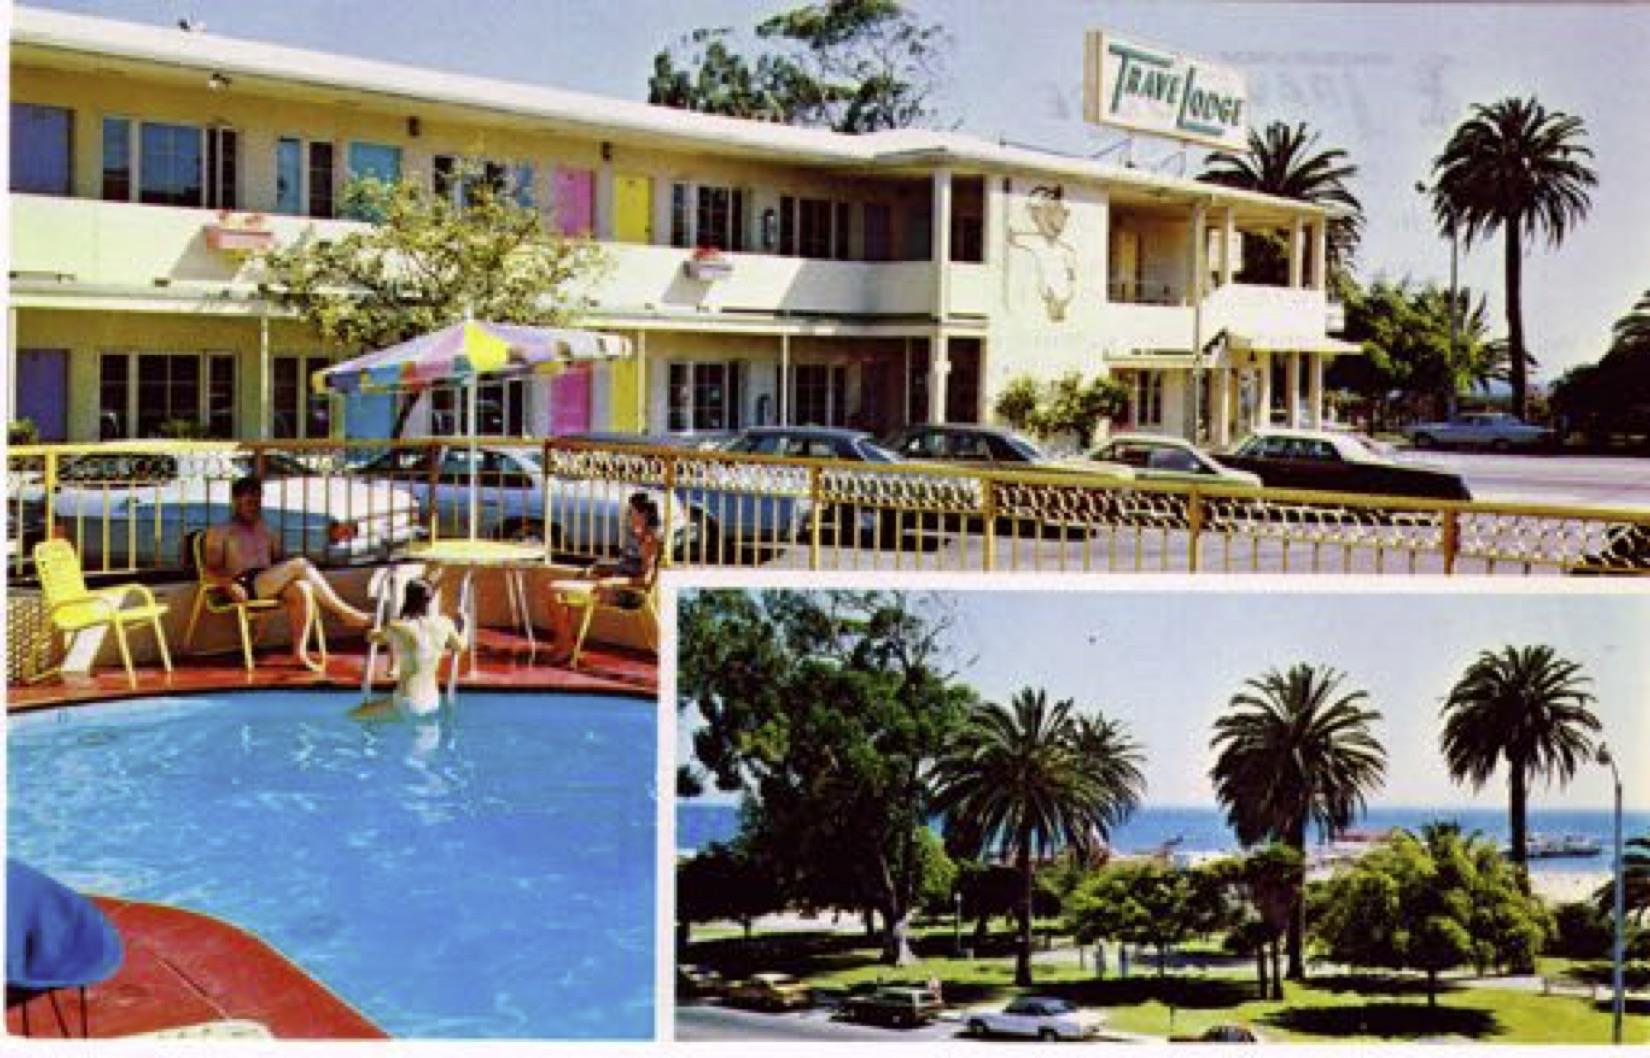 PHOTO_Travel Lodge - Santa Monica (small file) copy.jpg